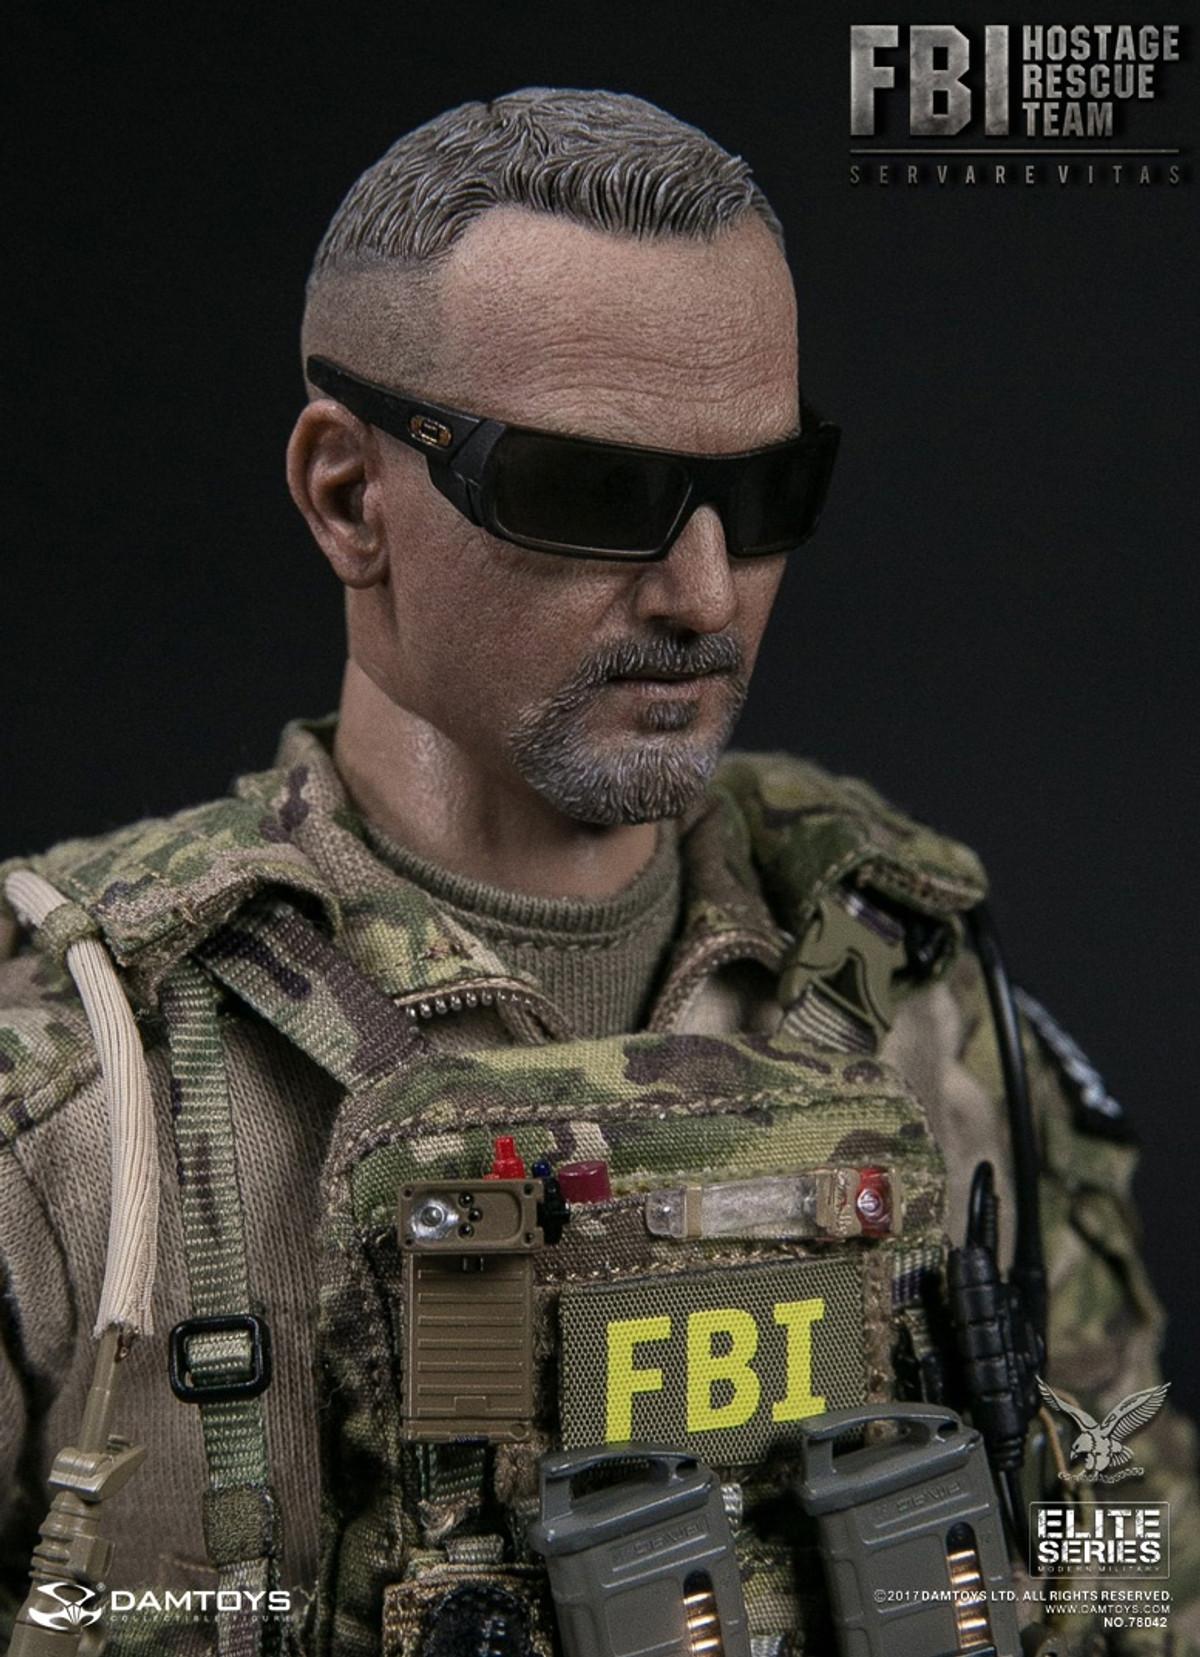 1//6 Scale Toy Hostage Rescue Team Multicam Ballistic Helmet w//GPNVG-18